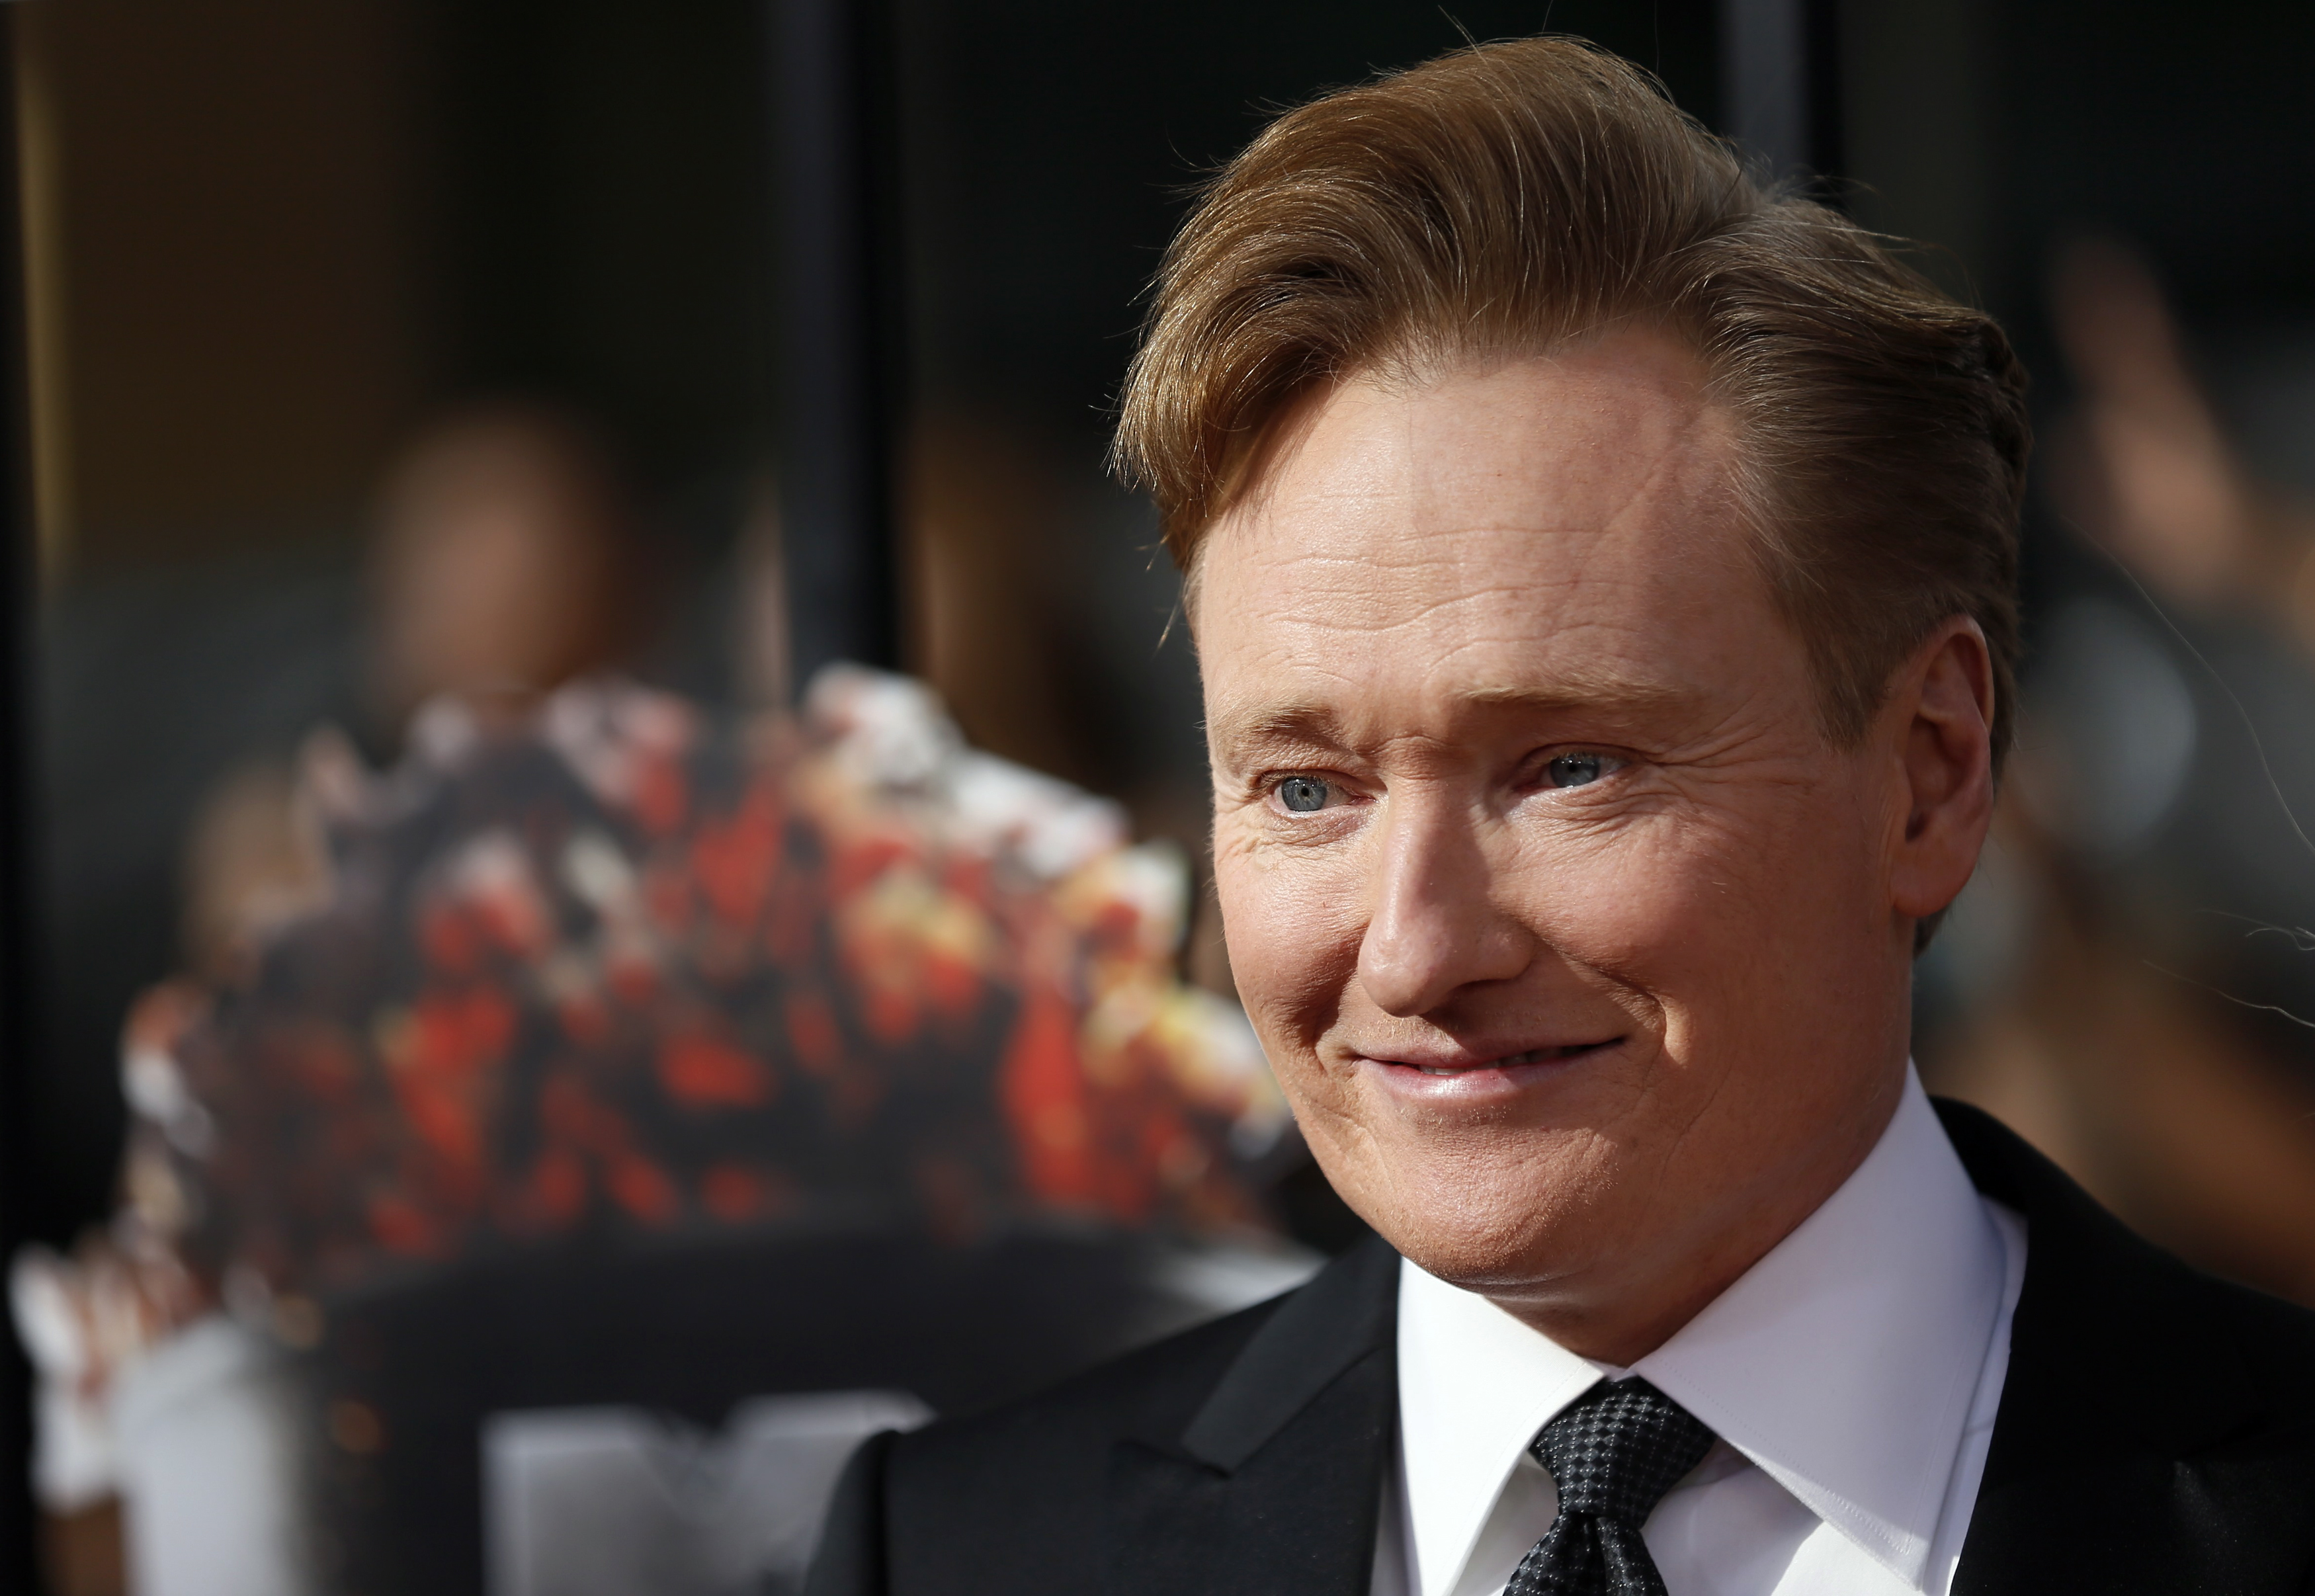 Conan O'Brien Breaks Out of the Bubble